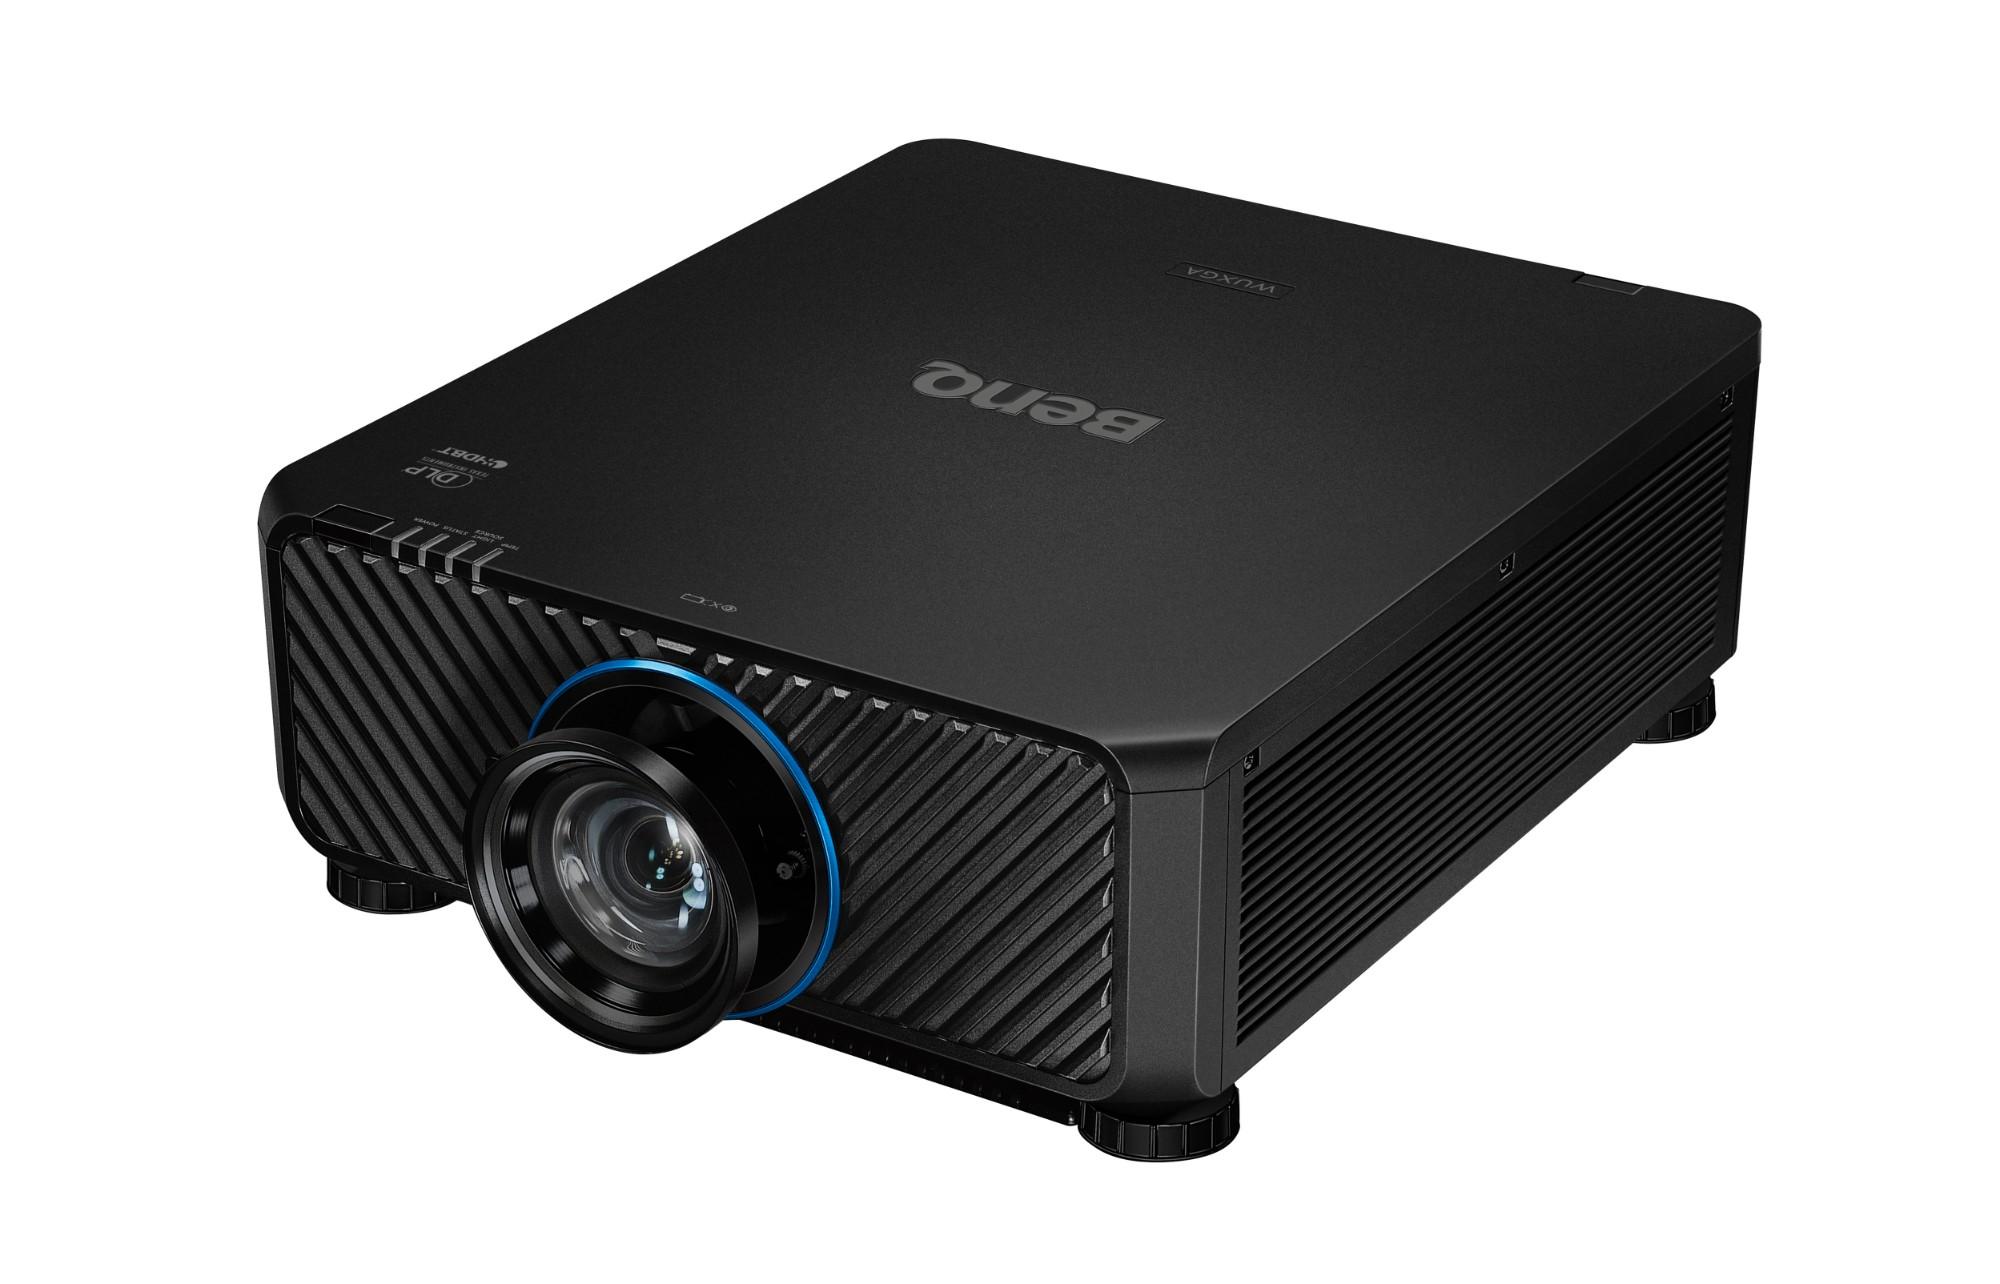 Benq LU9715 8000ANSI lumens DLP WUXGA (1920x1200) Black data projector